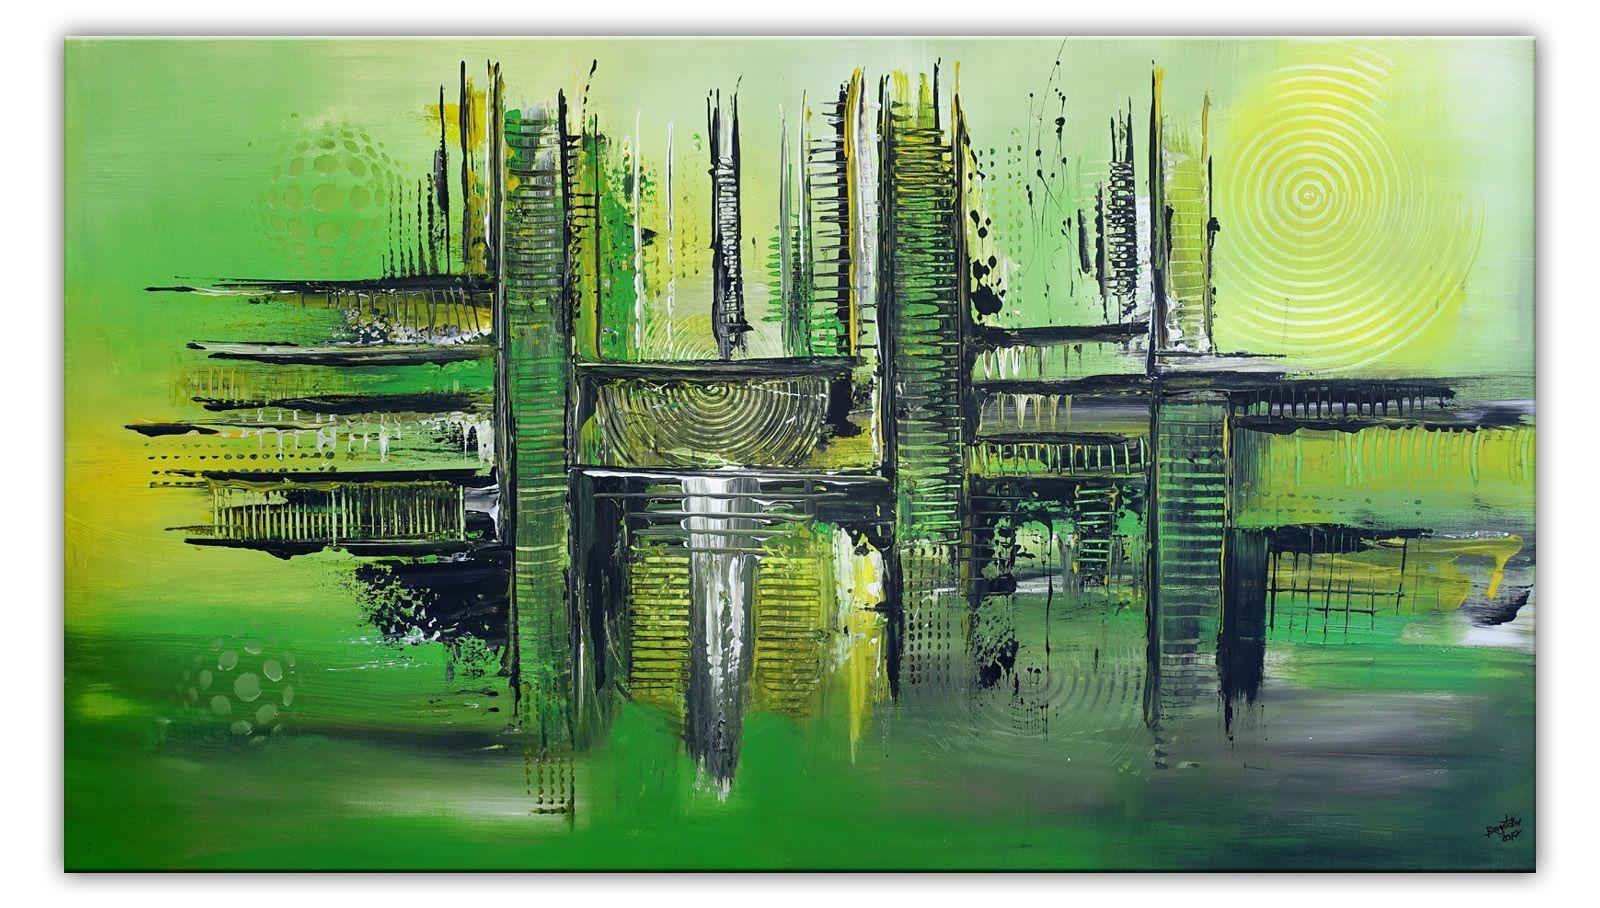 abstraktes kunst bild leinwandbild wandbild grun abstrakte malerei bilder modern abstrakt geometrische abstraktion künstler